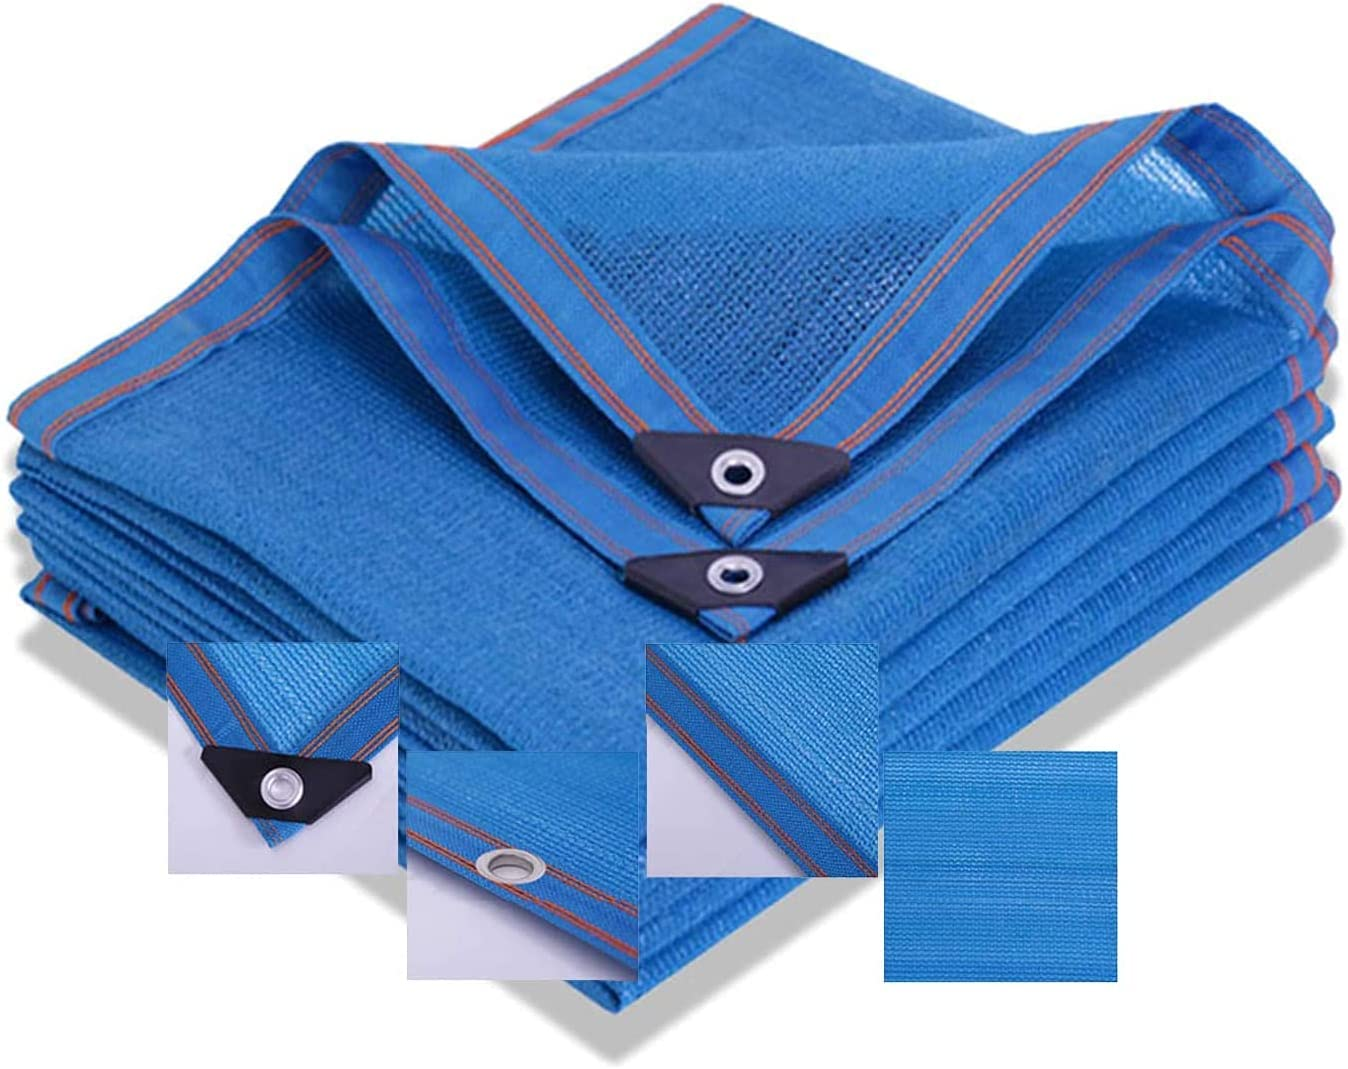 Max 59% OFF Edthorm Shade Net Cloth Sunshade Mesh with Gro 1 year warranty